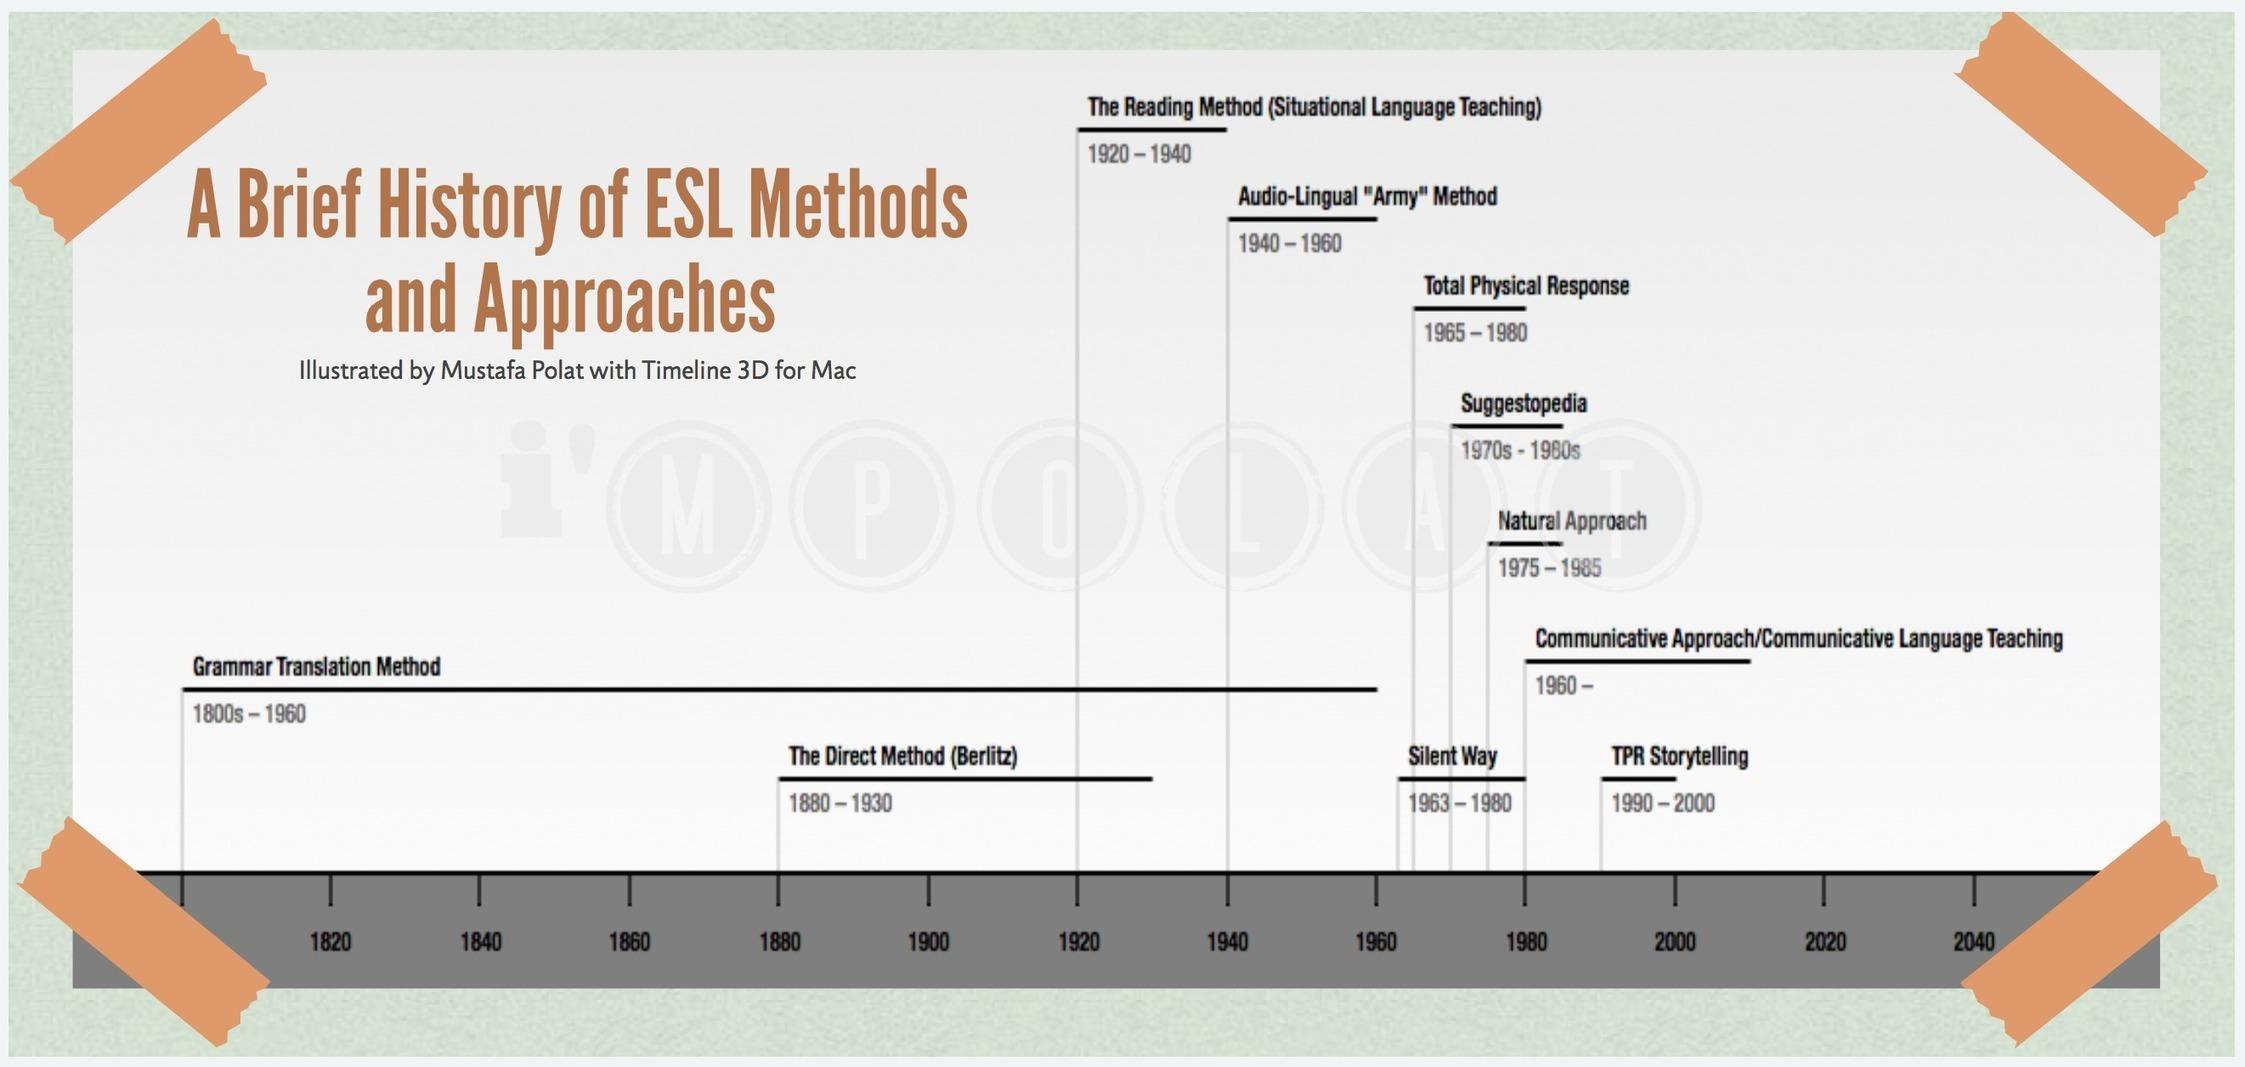 English Language and Applied Linguistics – University of Reading